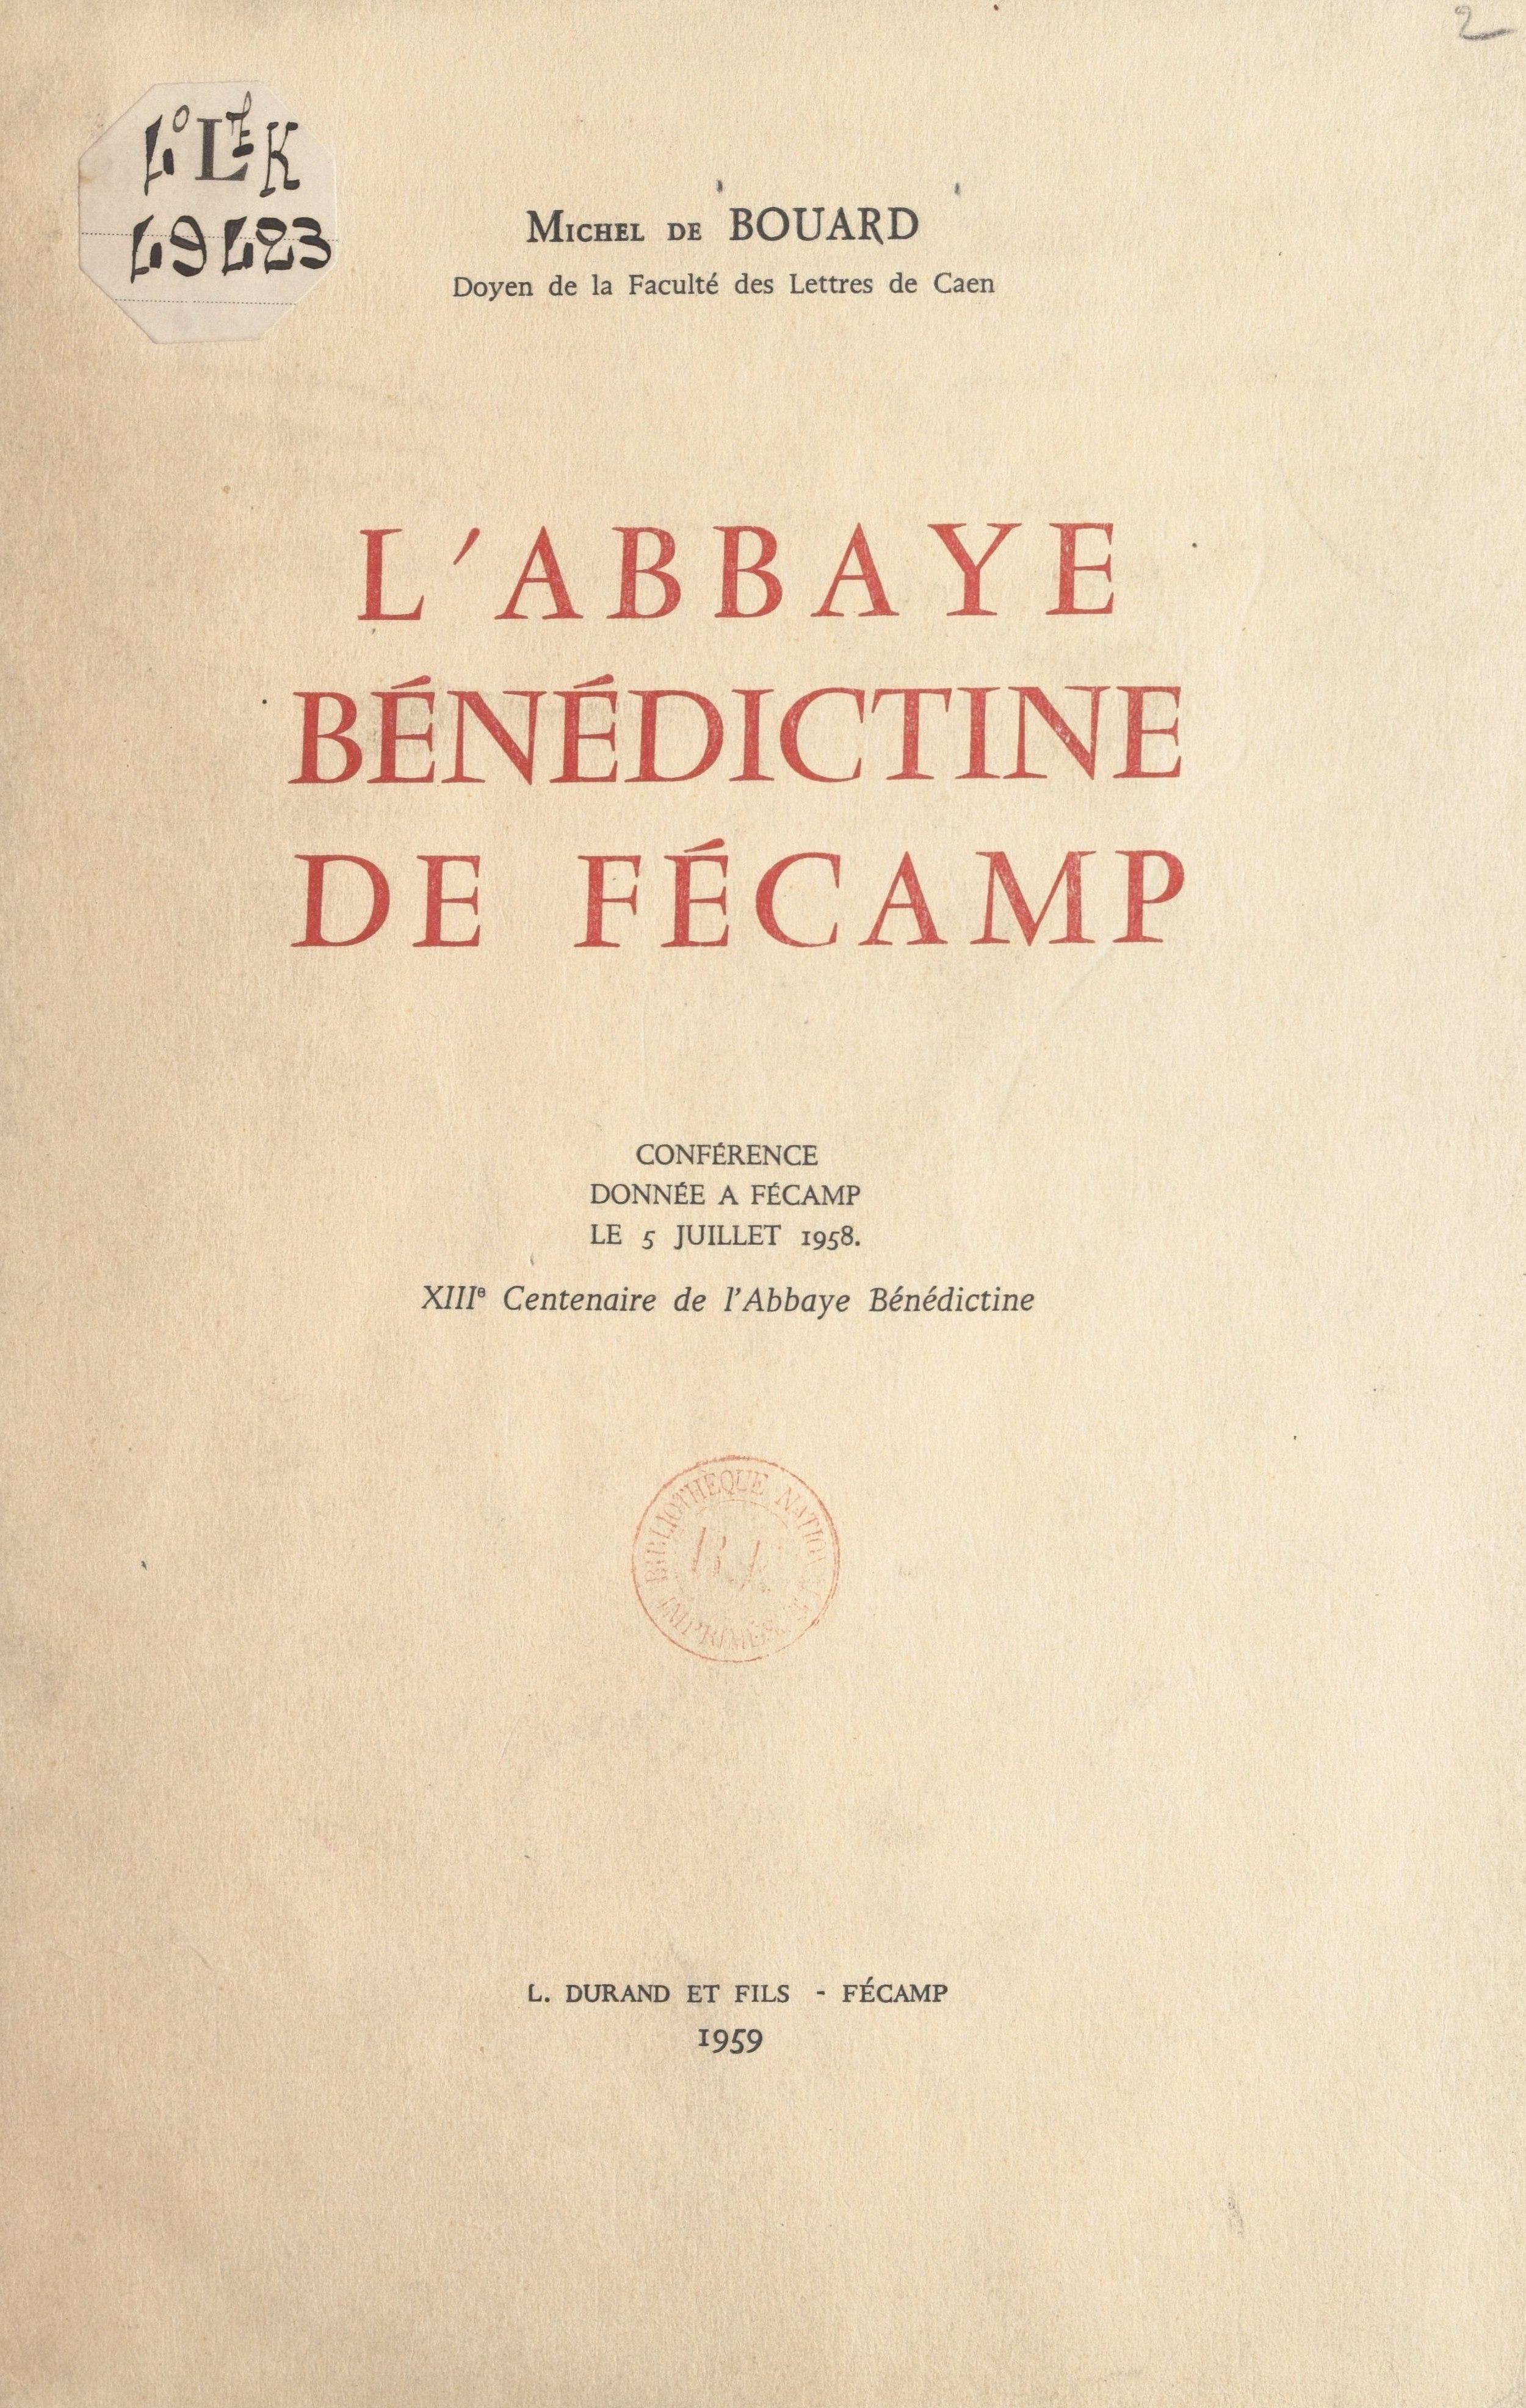 L'abbaye bénédictine de Fécamp